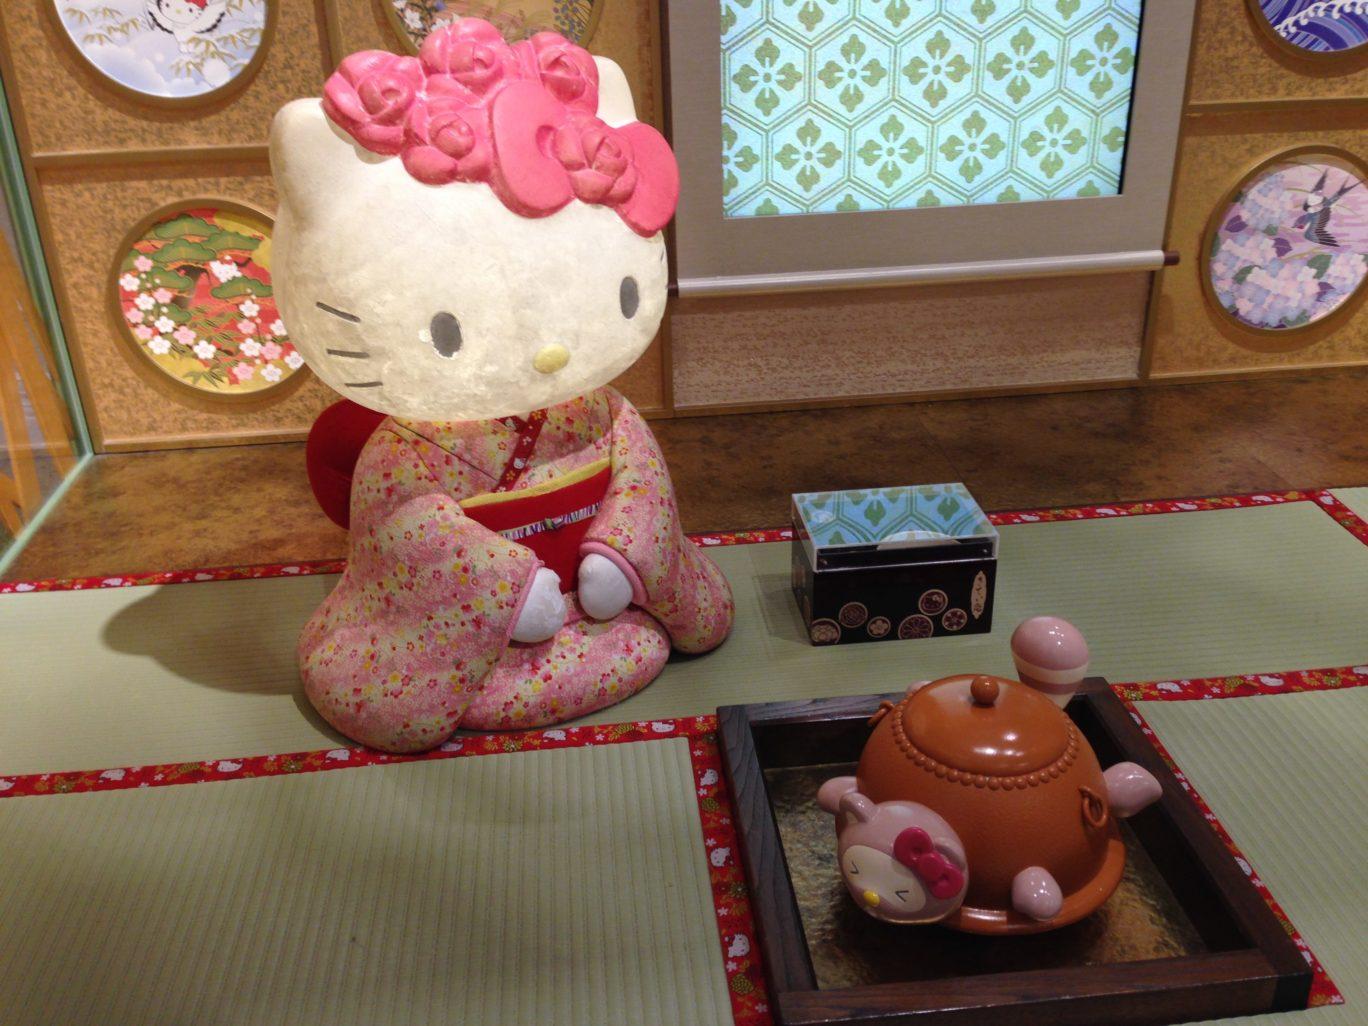 IMG_2914Litte twin stars Sanrio Puroland Hello Kitty Sanrioland Sanrio Kawaii Tama Japan Tokyo